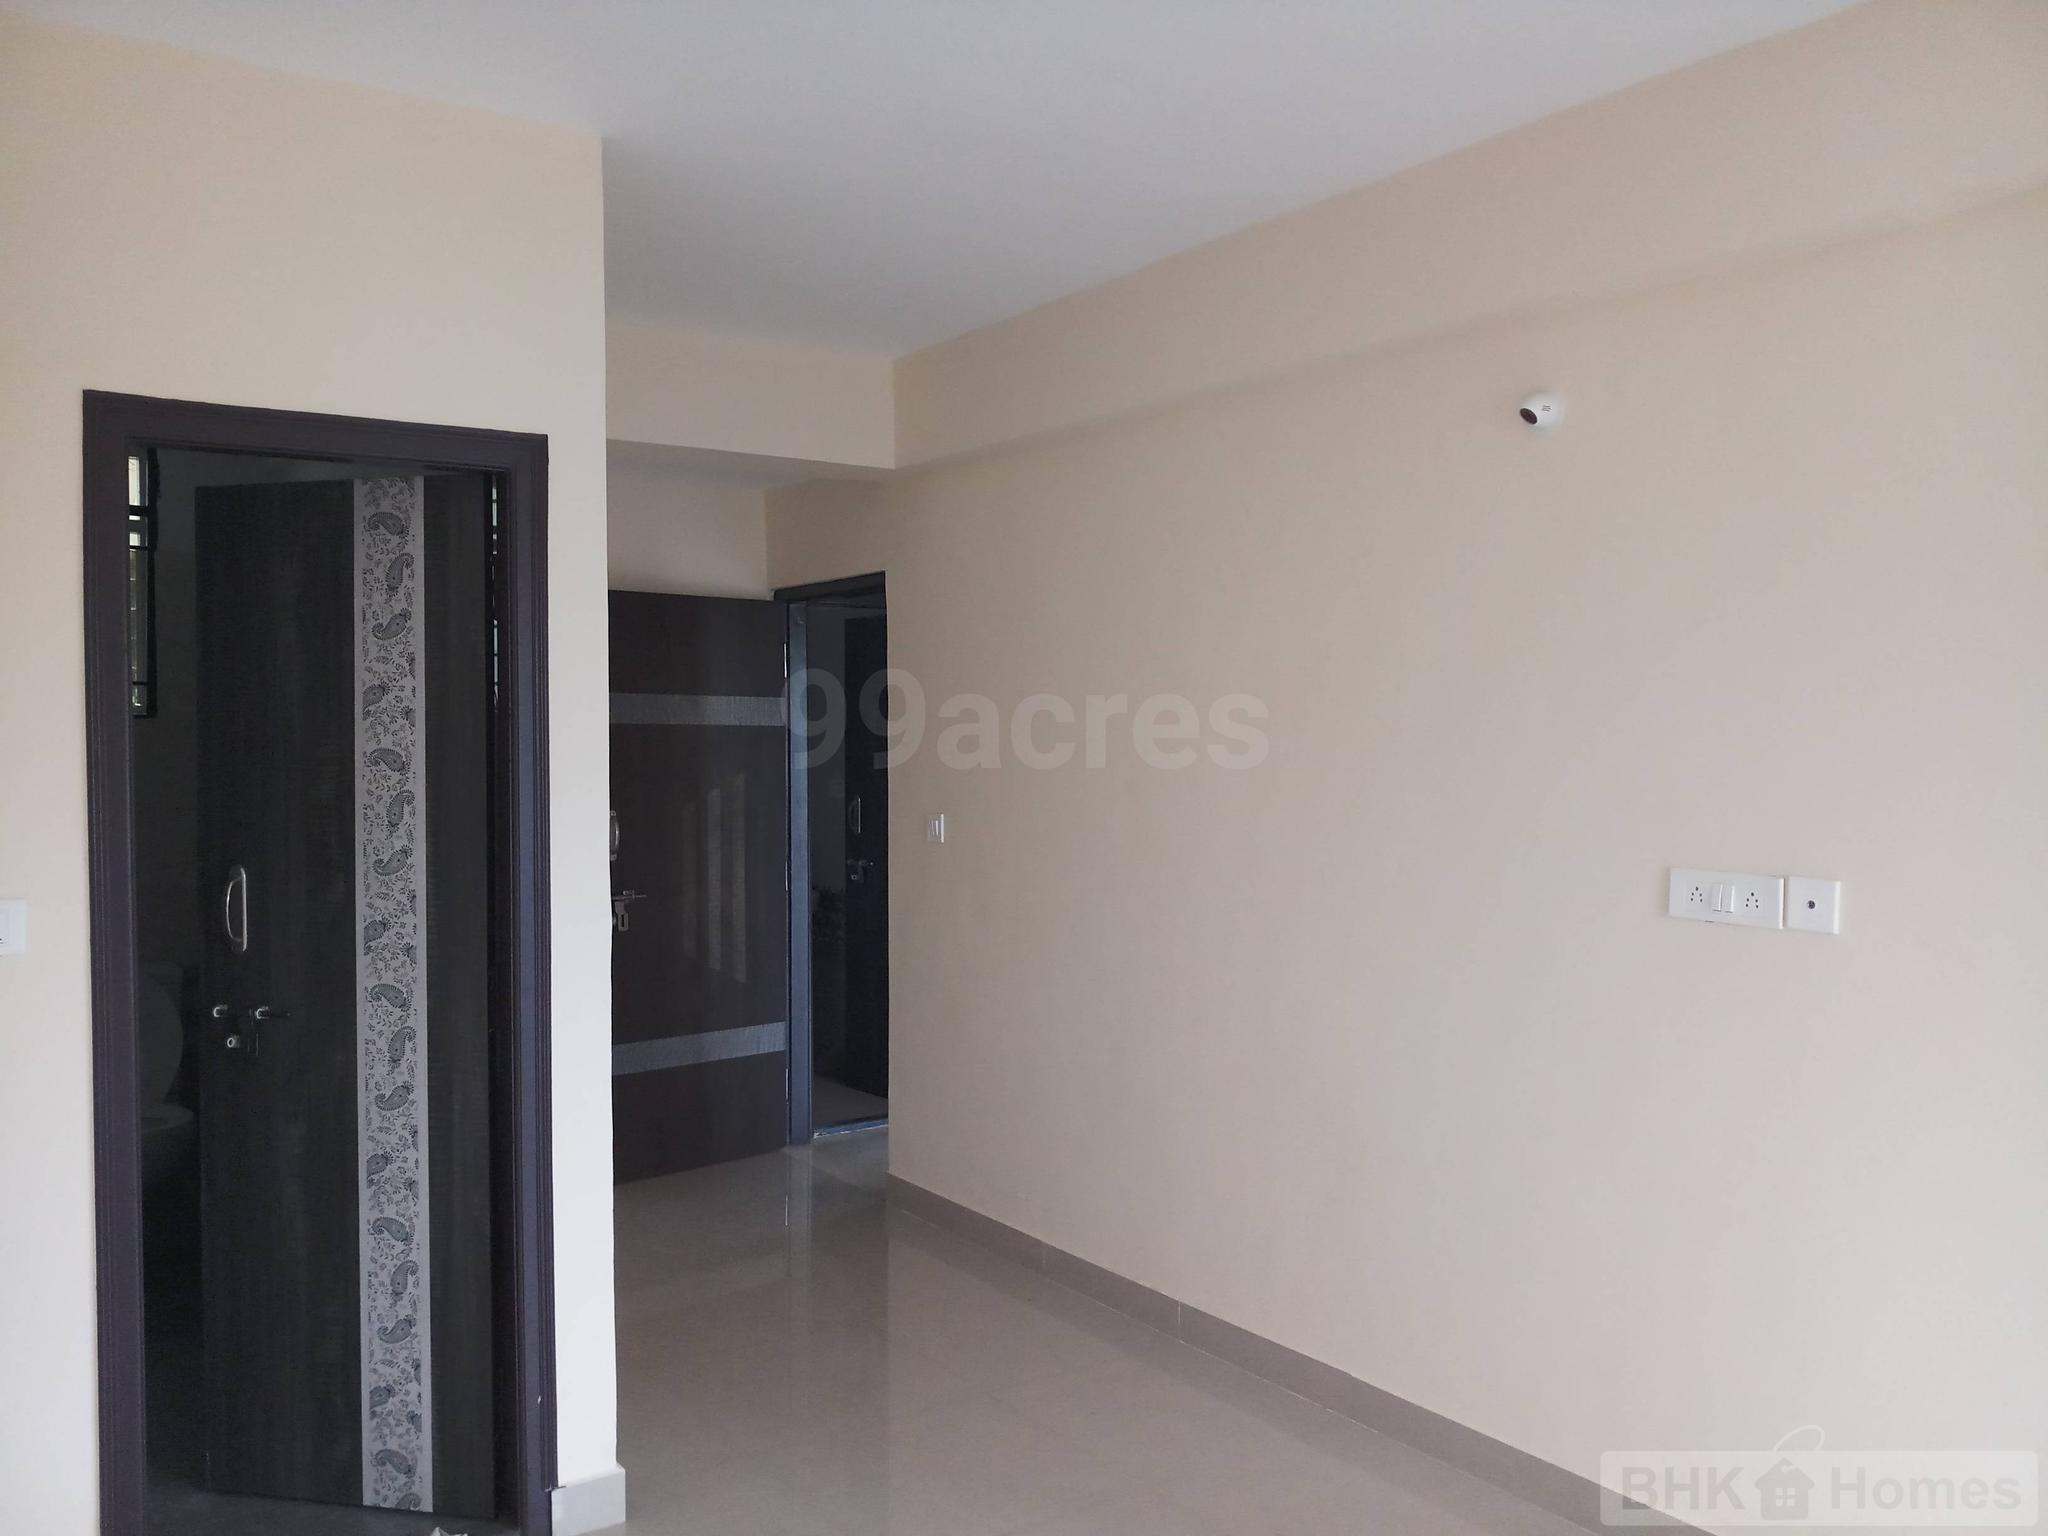 2 BHK Residential Apartment for Sale in Yelahanka